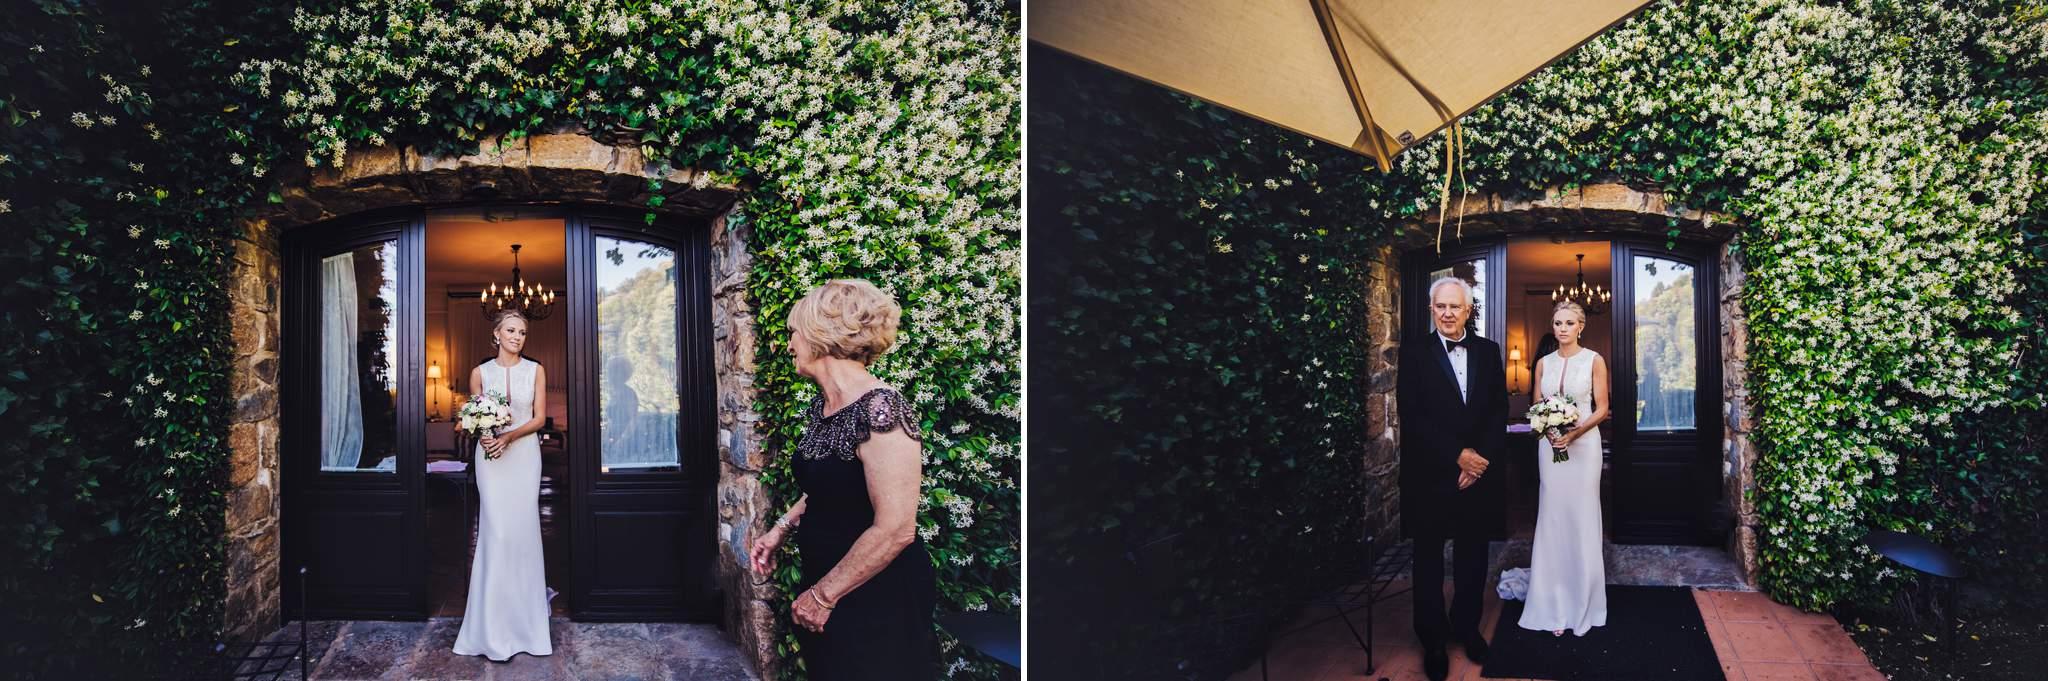 17wedding-photographer-belmond-san-michele-florence